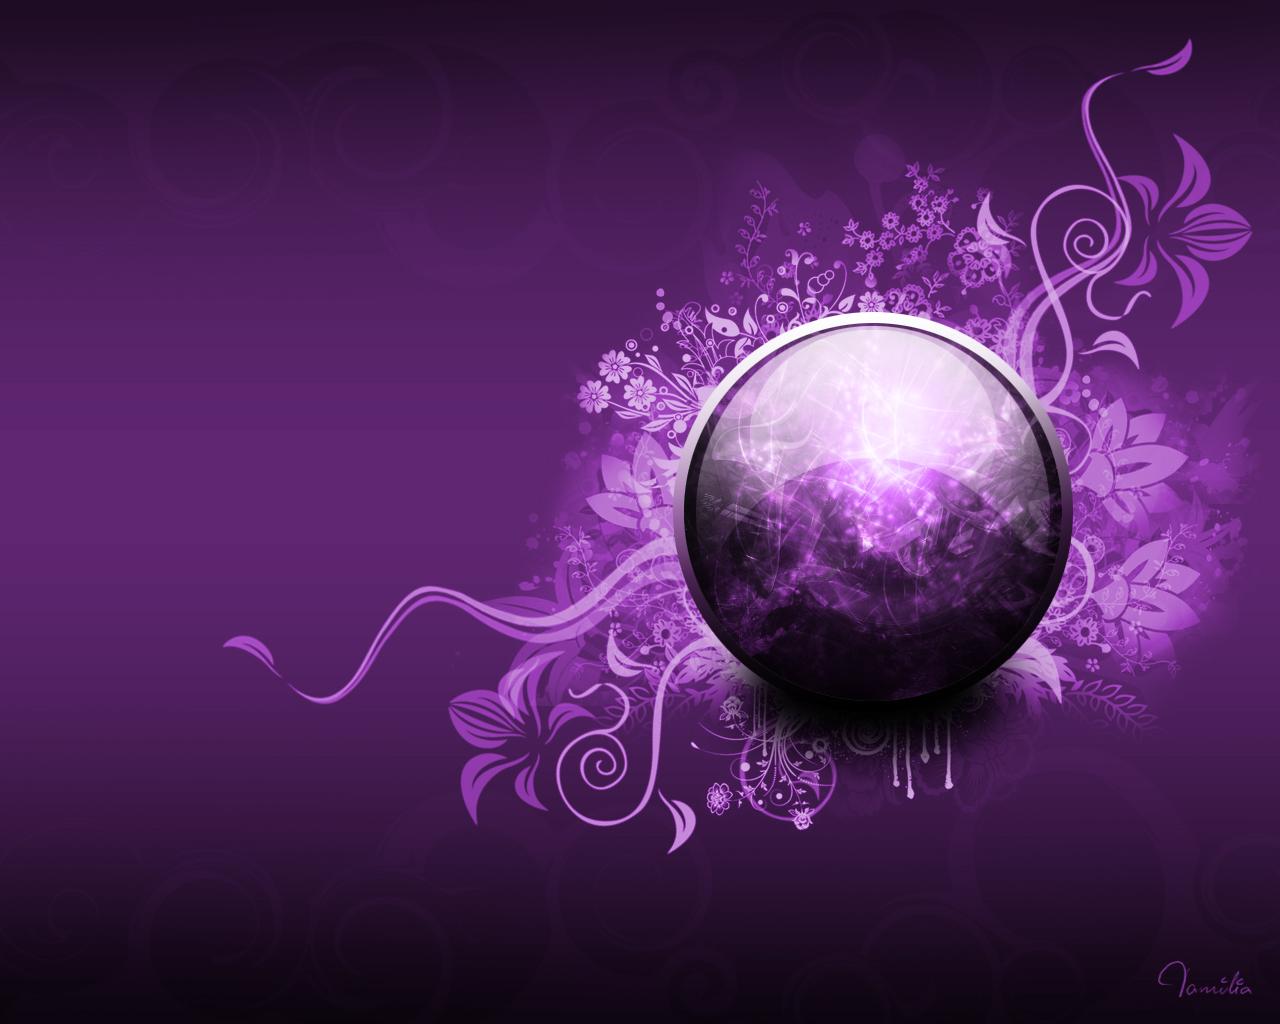 purple wallpaper 3 - photo #12